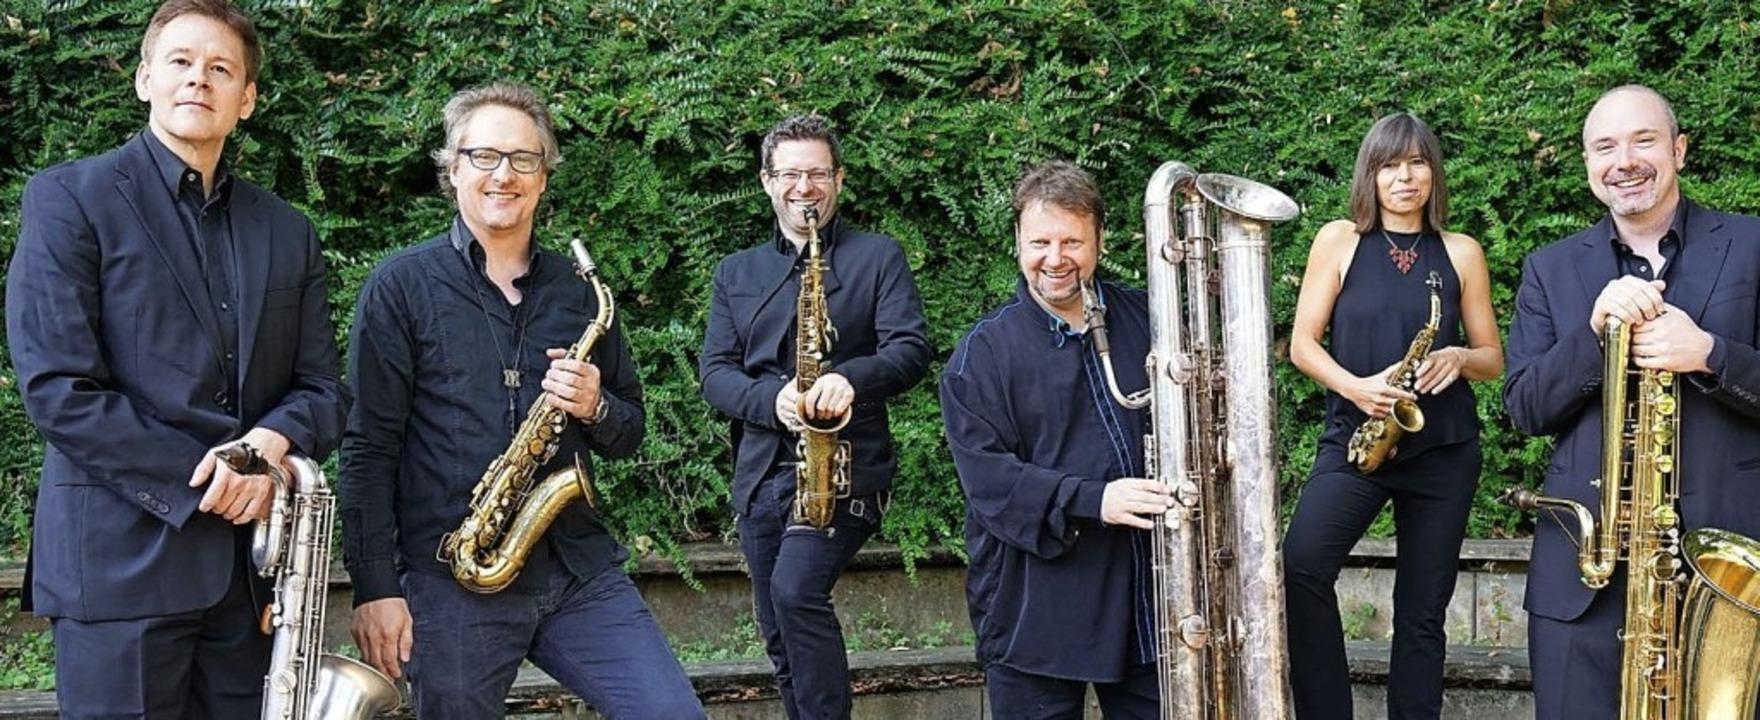 Gruppenbild mit Dame: das Raschèr Saxophone Quartet in Sextett-Besetzung  | Foto: Roger Hanschel